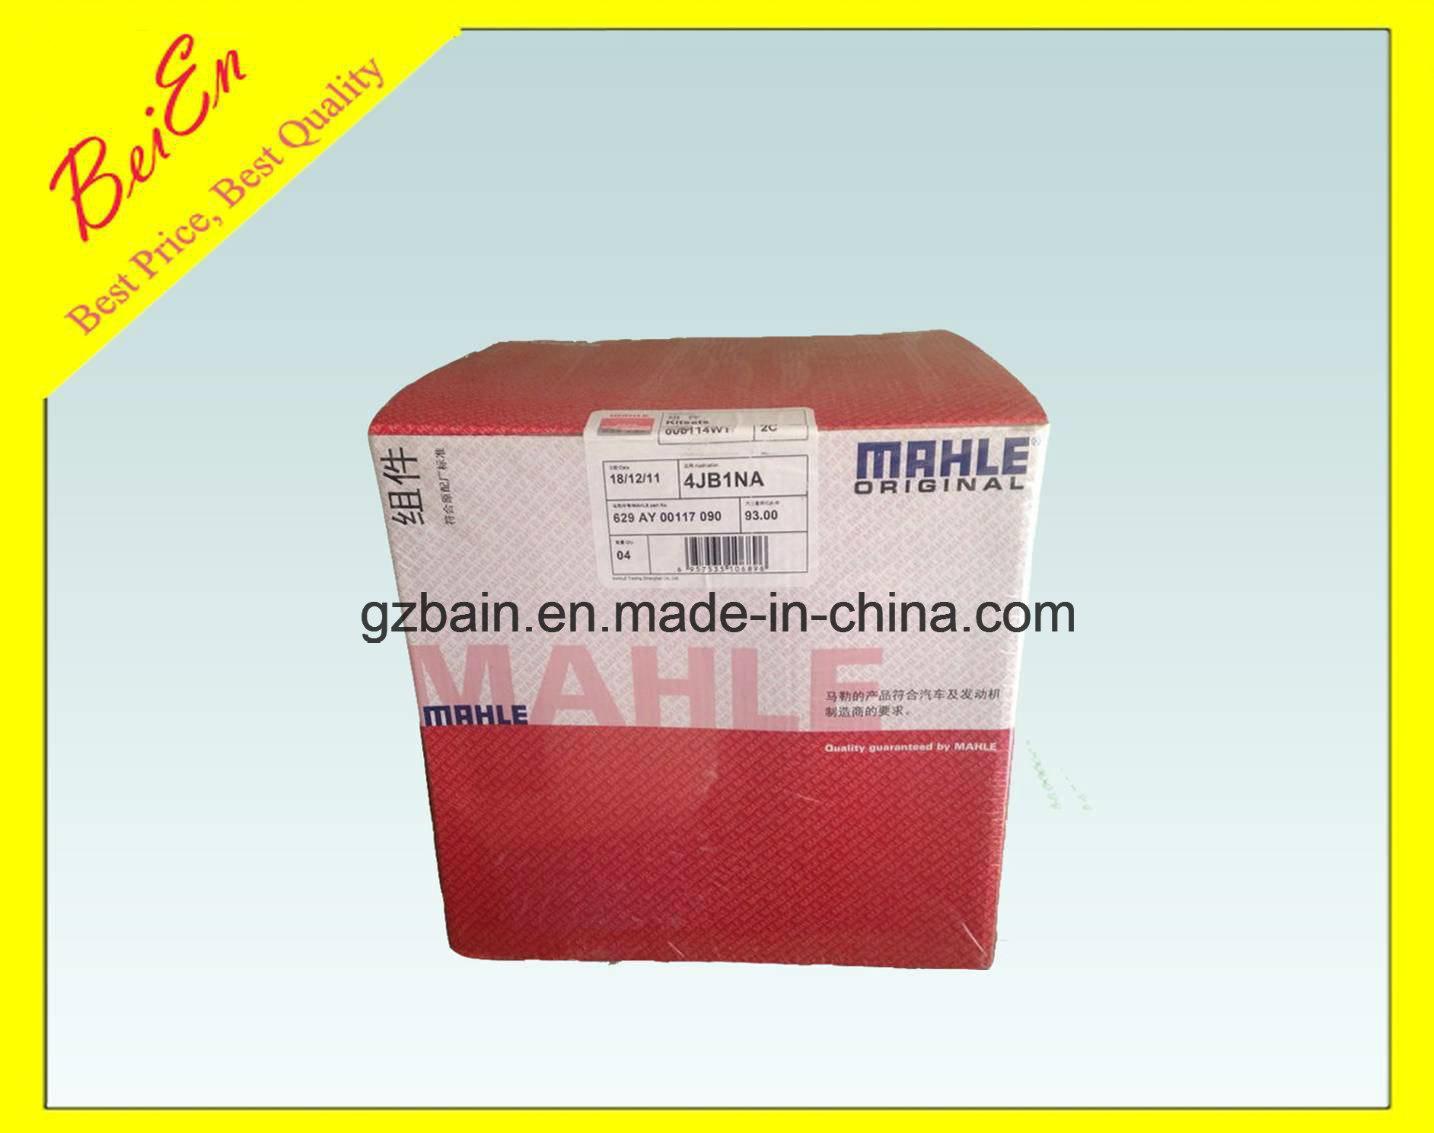 Mahle (IZUMI) Liner Kit for Isuzu Excavator 4jb1/4jb1t/4jb1na Best Price